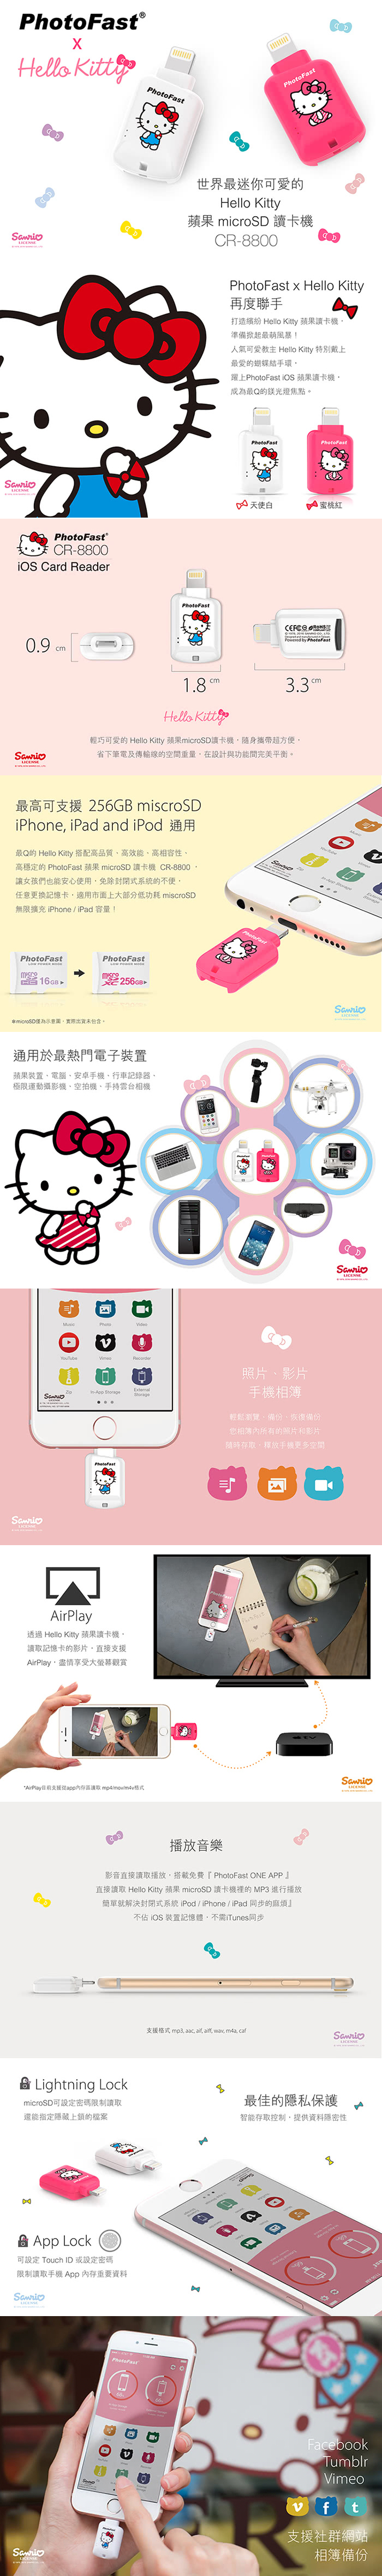 Photofast | Hello Kitty 蘋果microSD讀卡機  CR-8800(不含記憶卡)